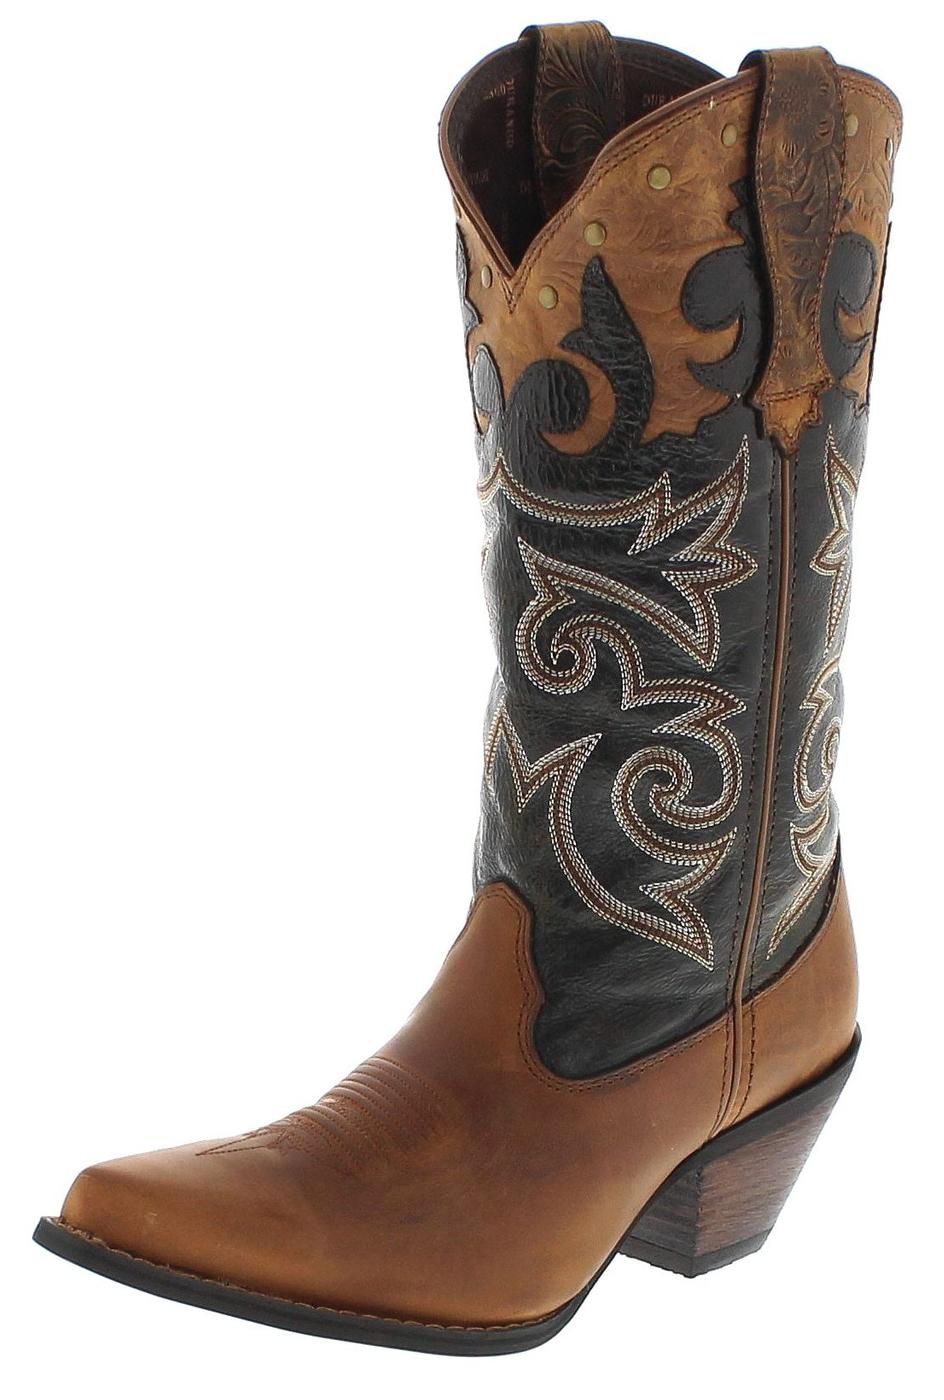 Durango Boots UNDERLAY DRD0066 Western boot